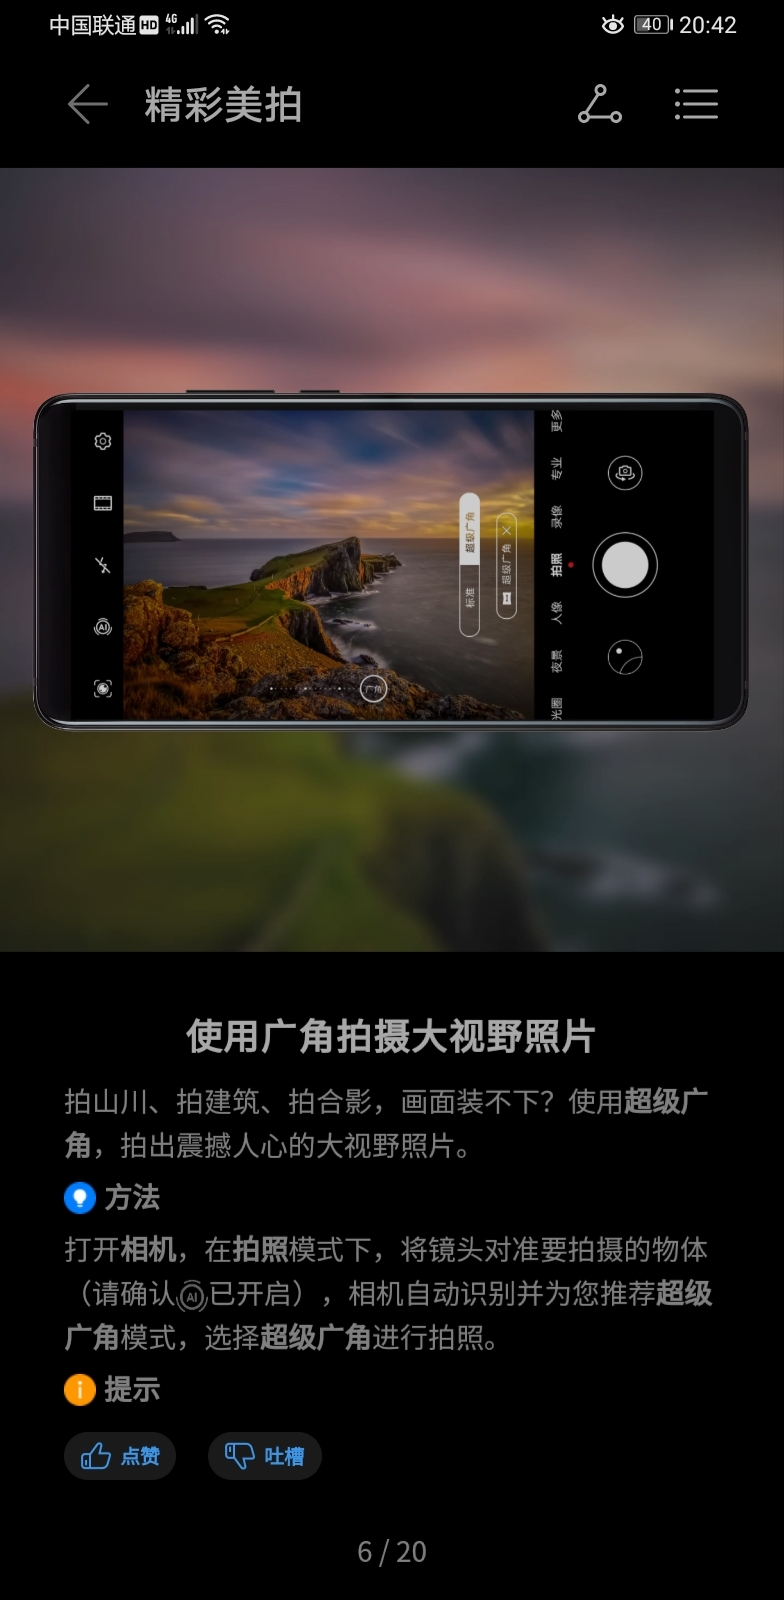 Screenshot_20200507_204206_com.huawei.android.tips.jpg